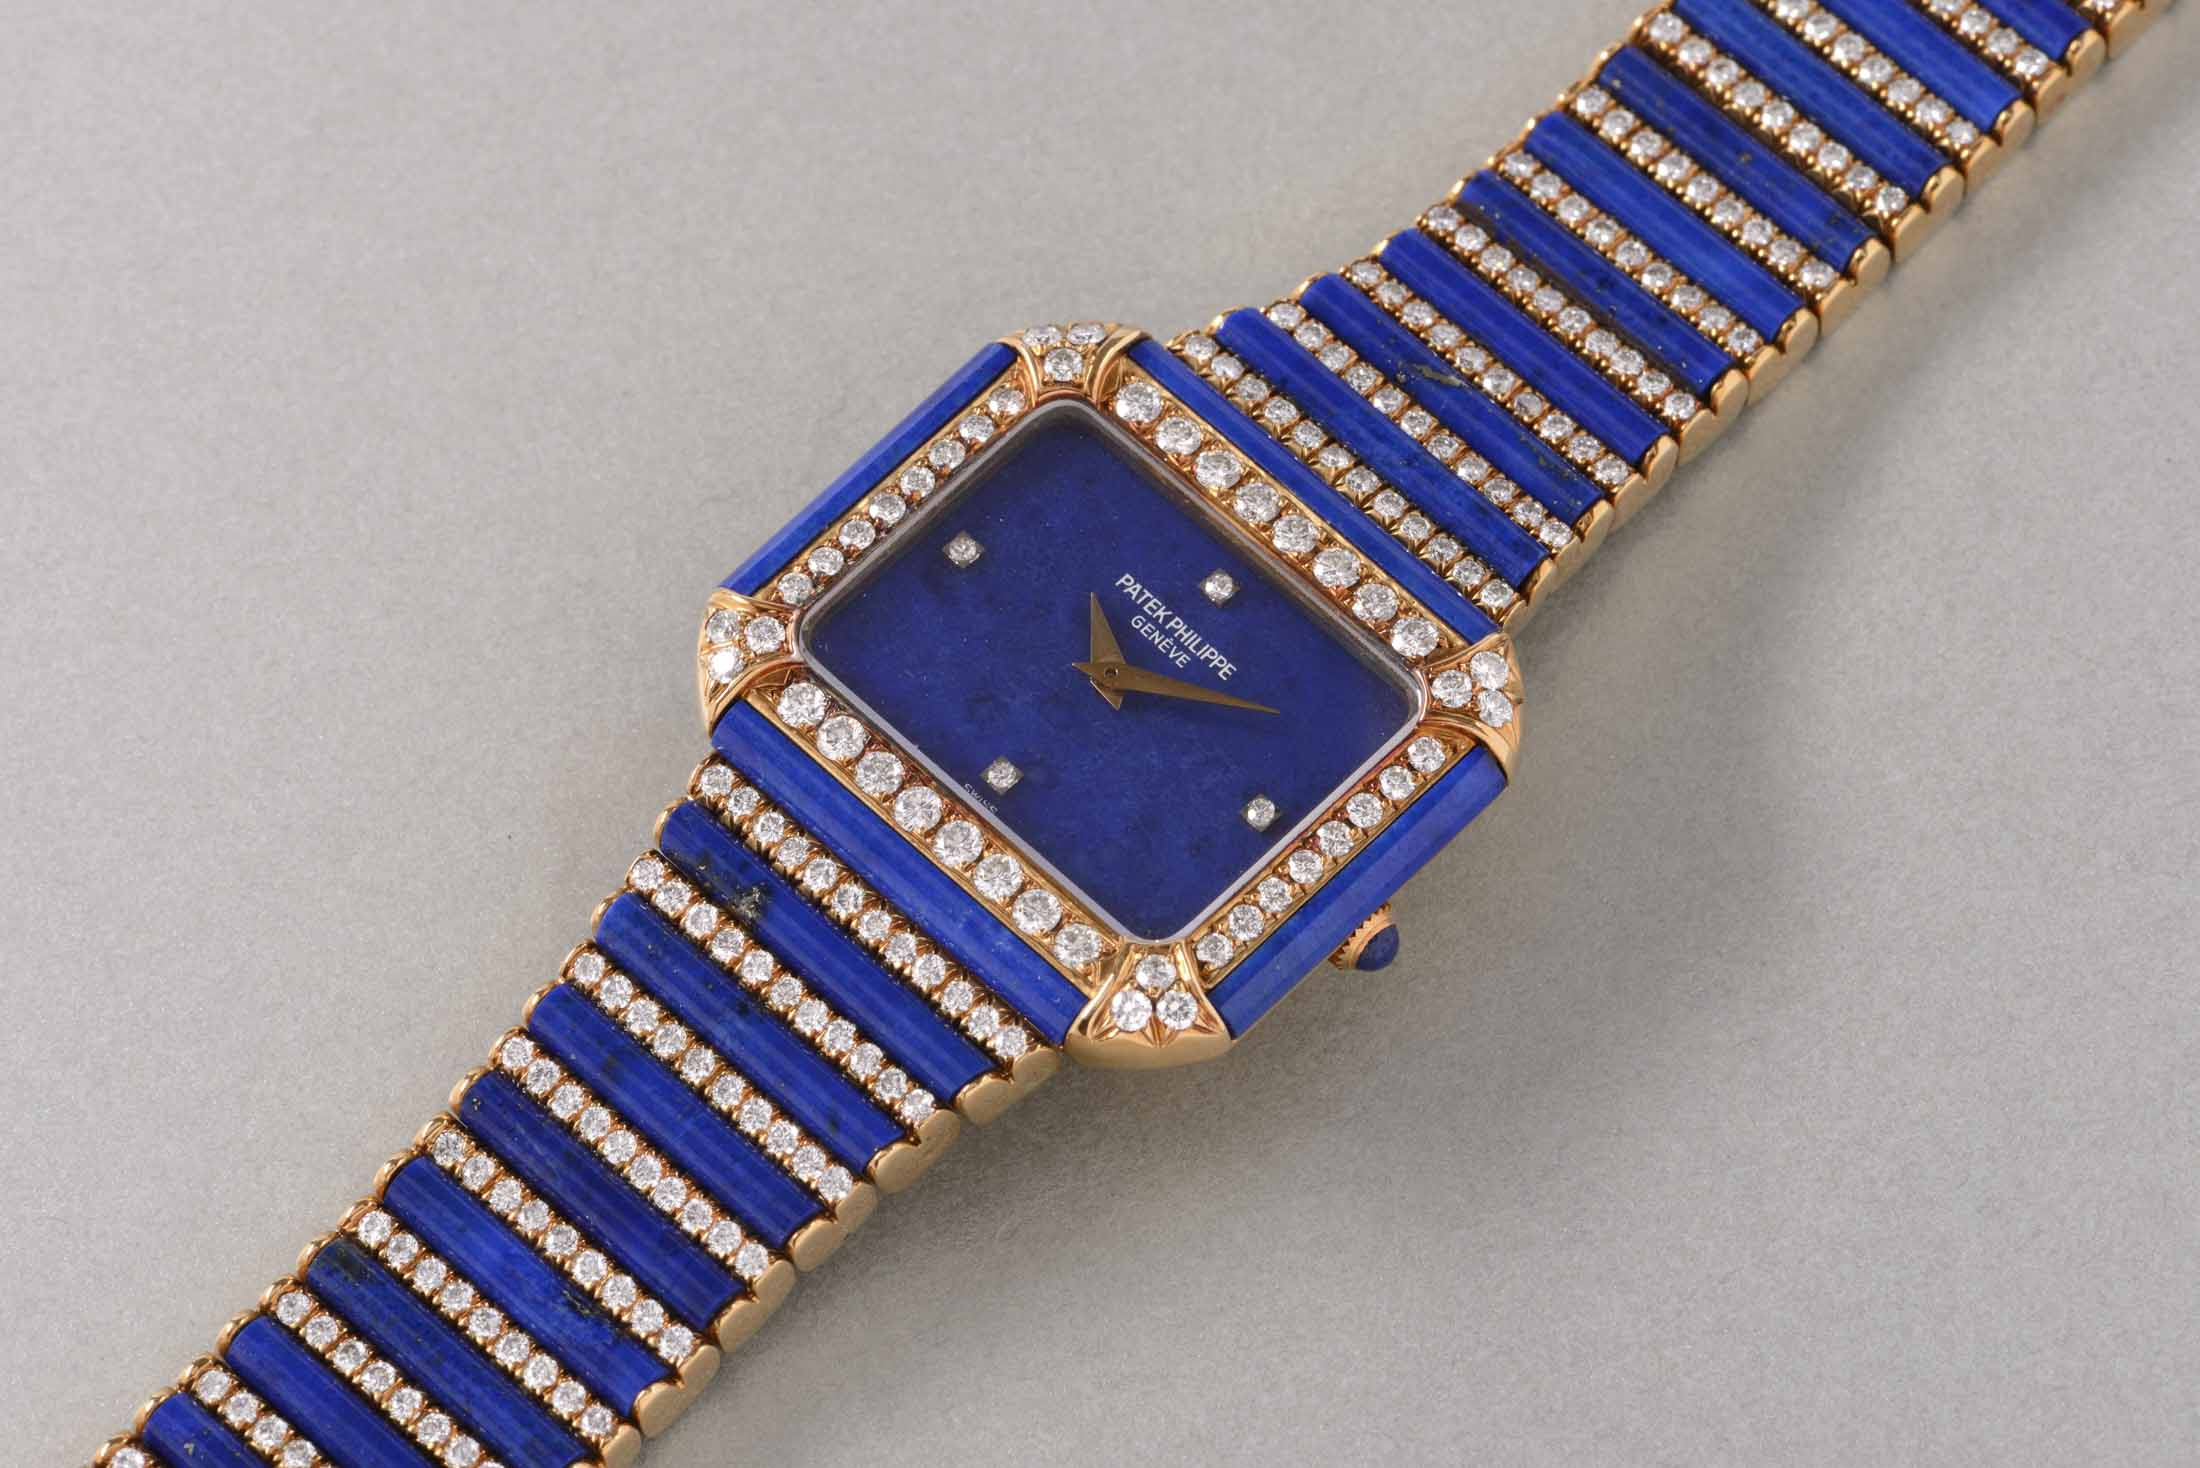 Patek Philippe Lady's Lapis Lazuli Wristwatch